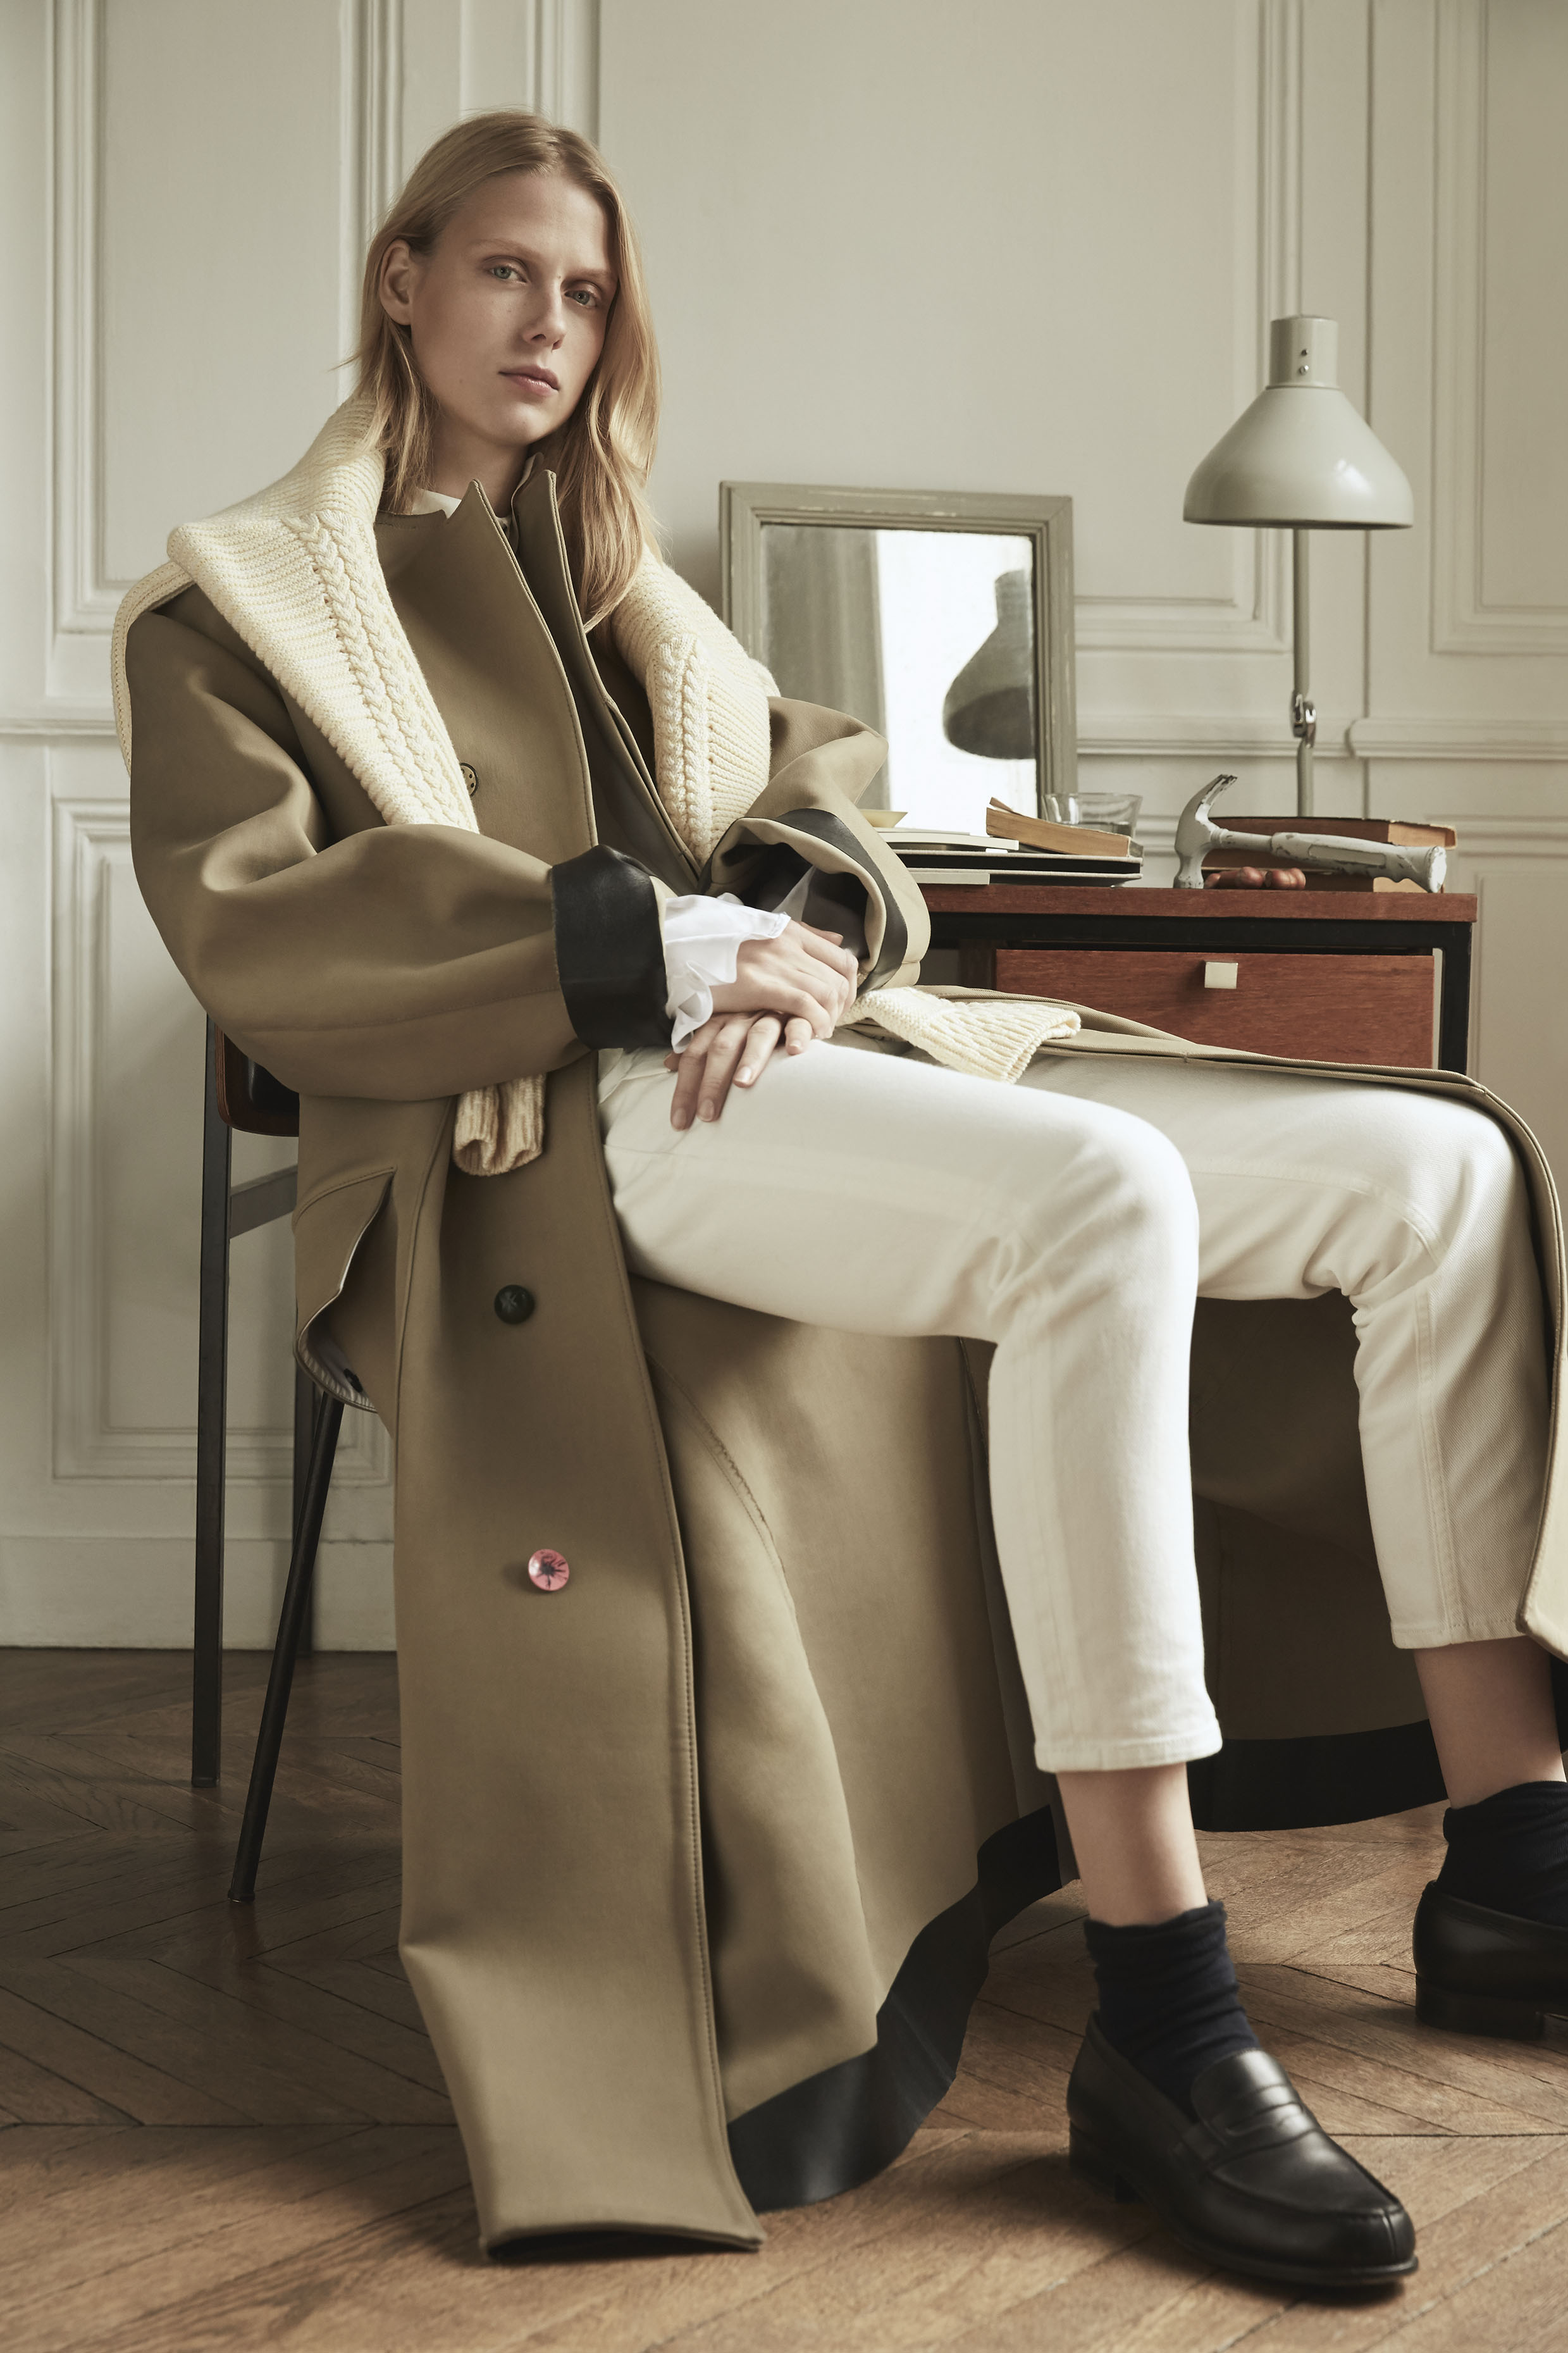 "L'Express Styles magazine ""Études de style"" | Carlotta Manaigo | L'Express Styles | Numerique Retouch Photo Retouching Studio"